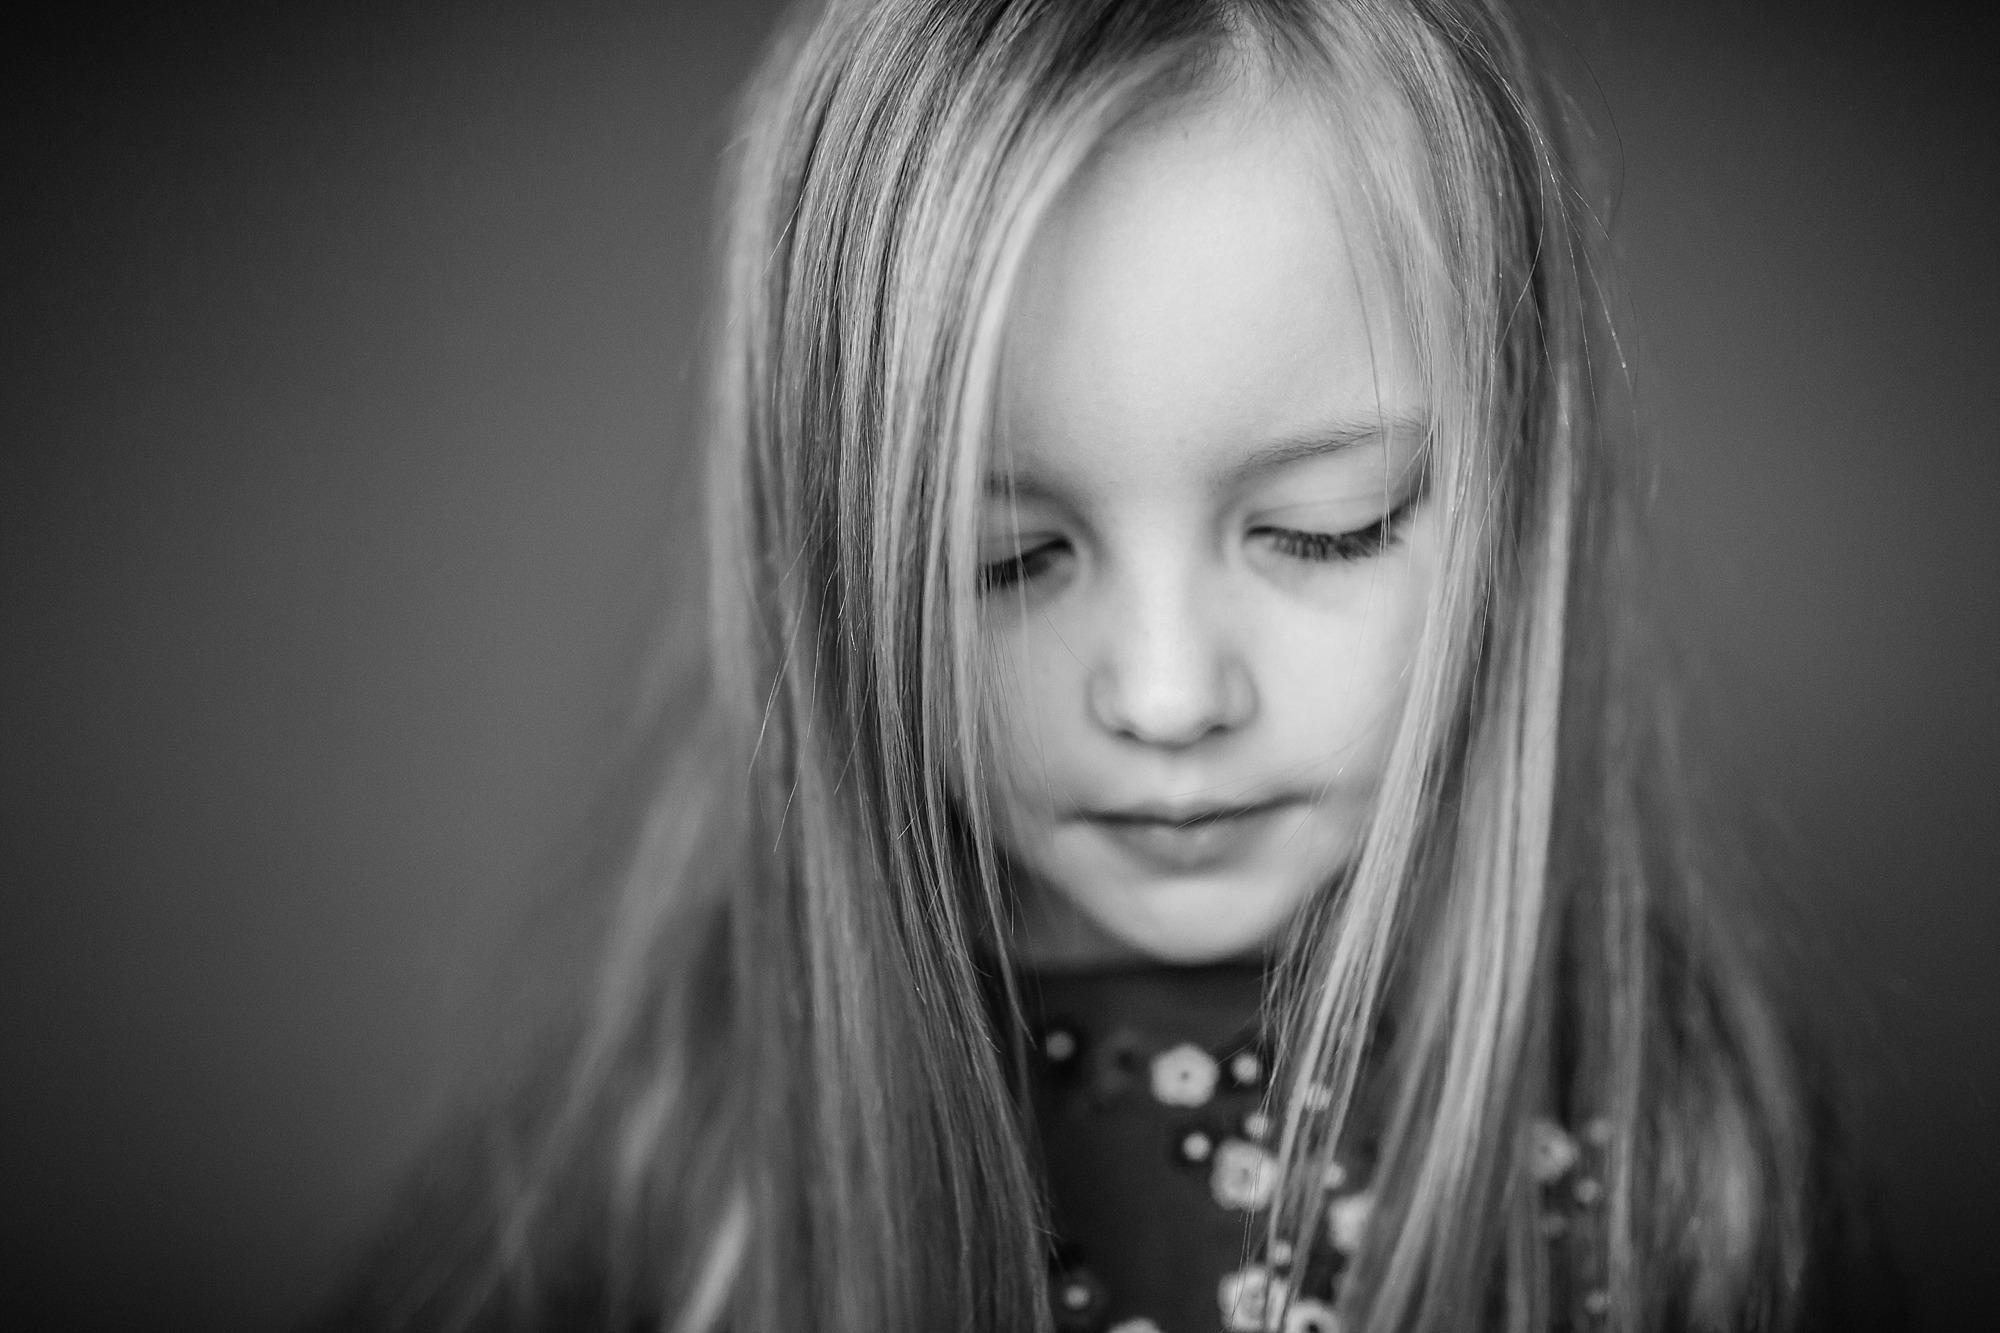 Modern_Childrens_Portraits_Hunnicutt_Photography_Collages_0007